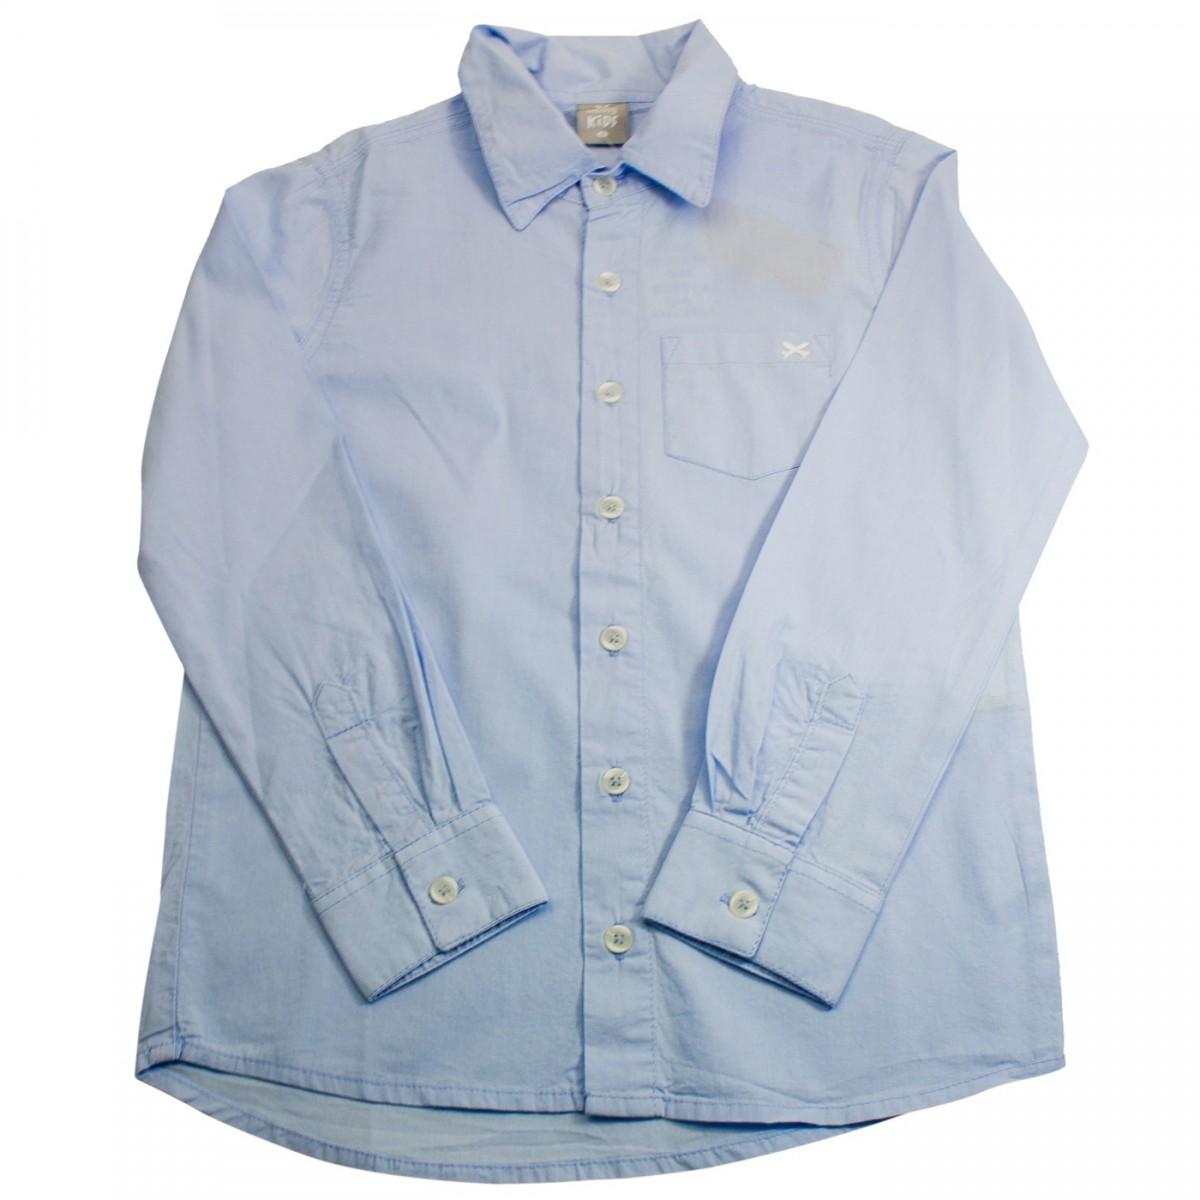 Bizz Store - Camisa Social Infantil Menino Hering Kids Branca 55fd1c56d6d19